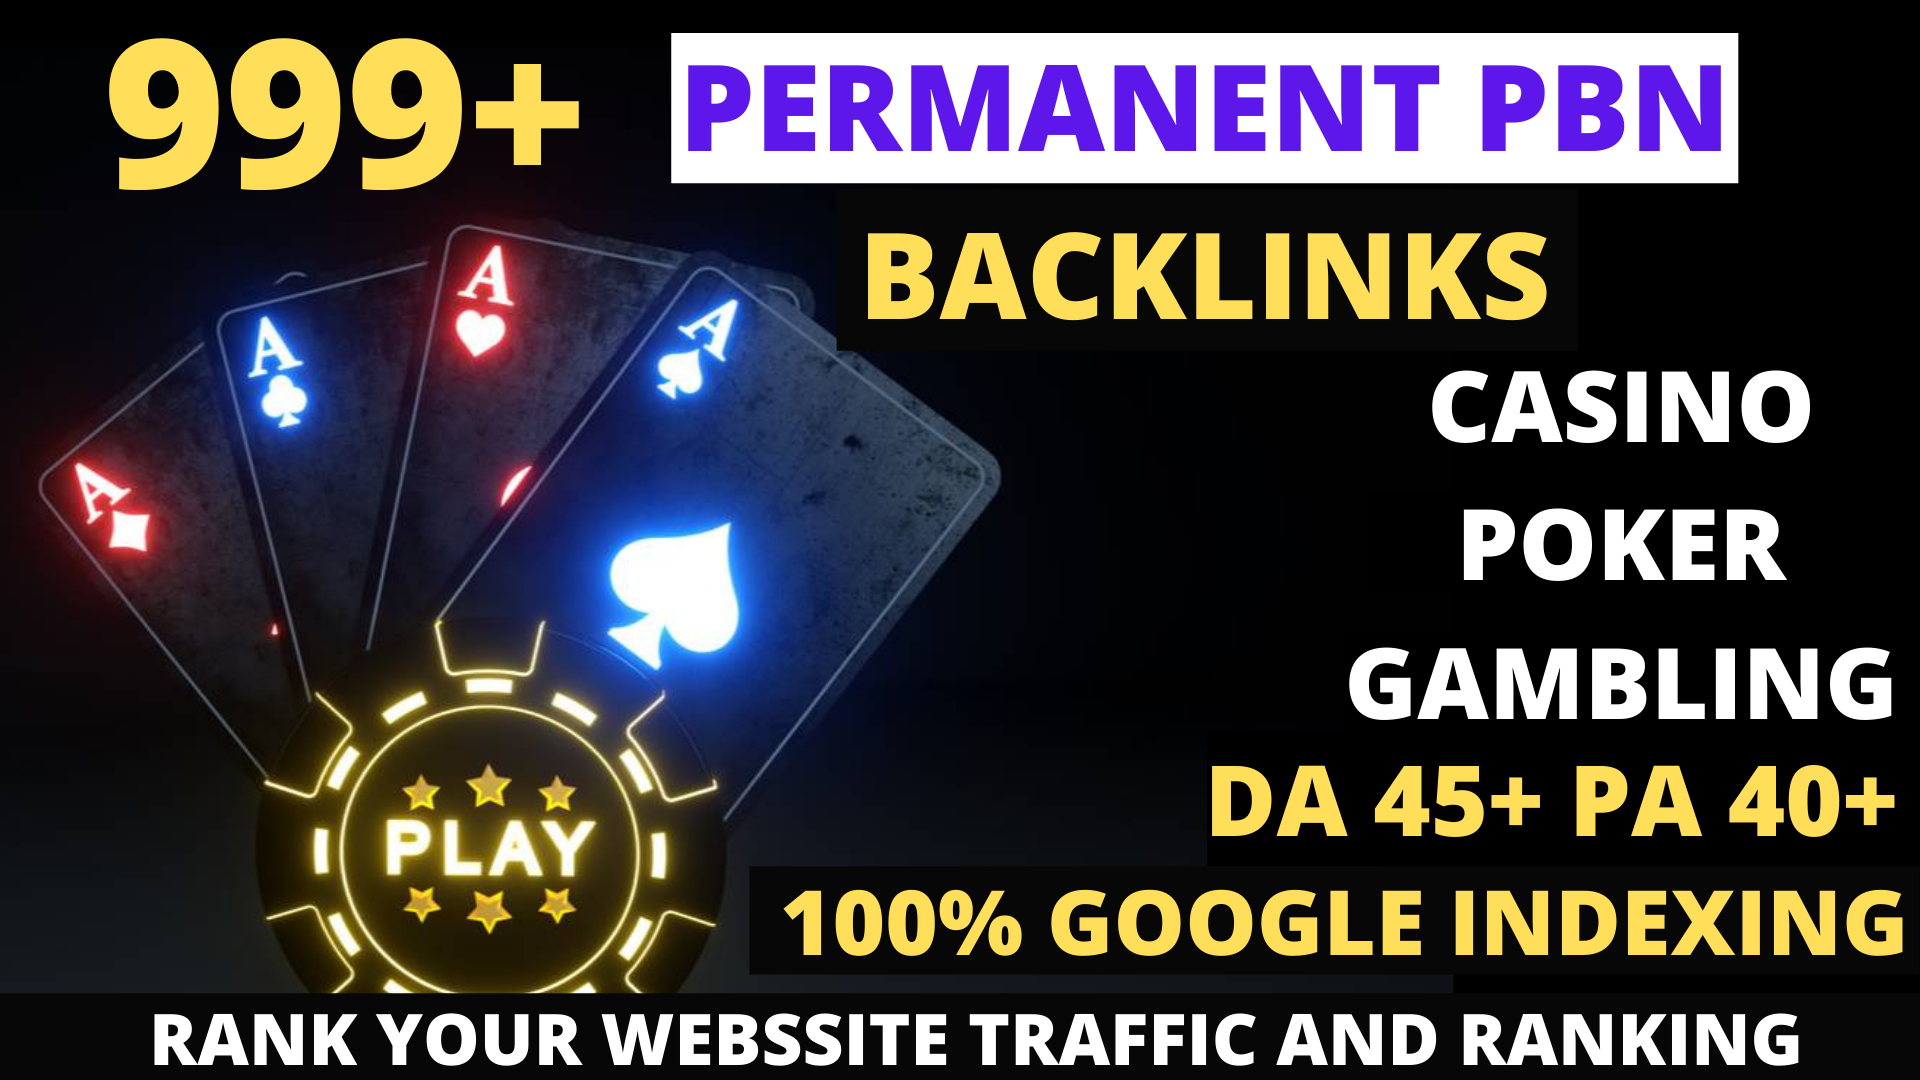 Permanent 999+ powerful Casino, Gambling, Poker, Sports High Quality Web2.0 Backlinks